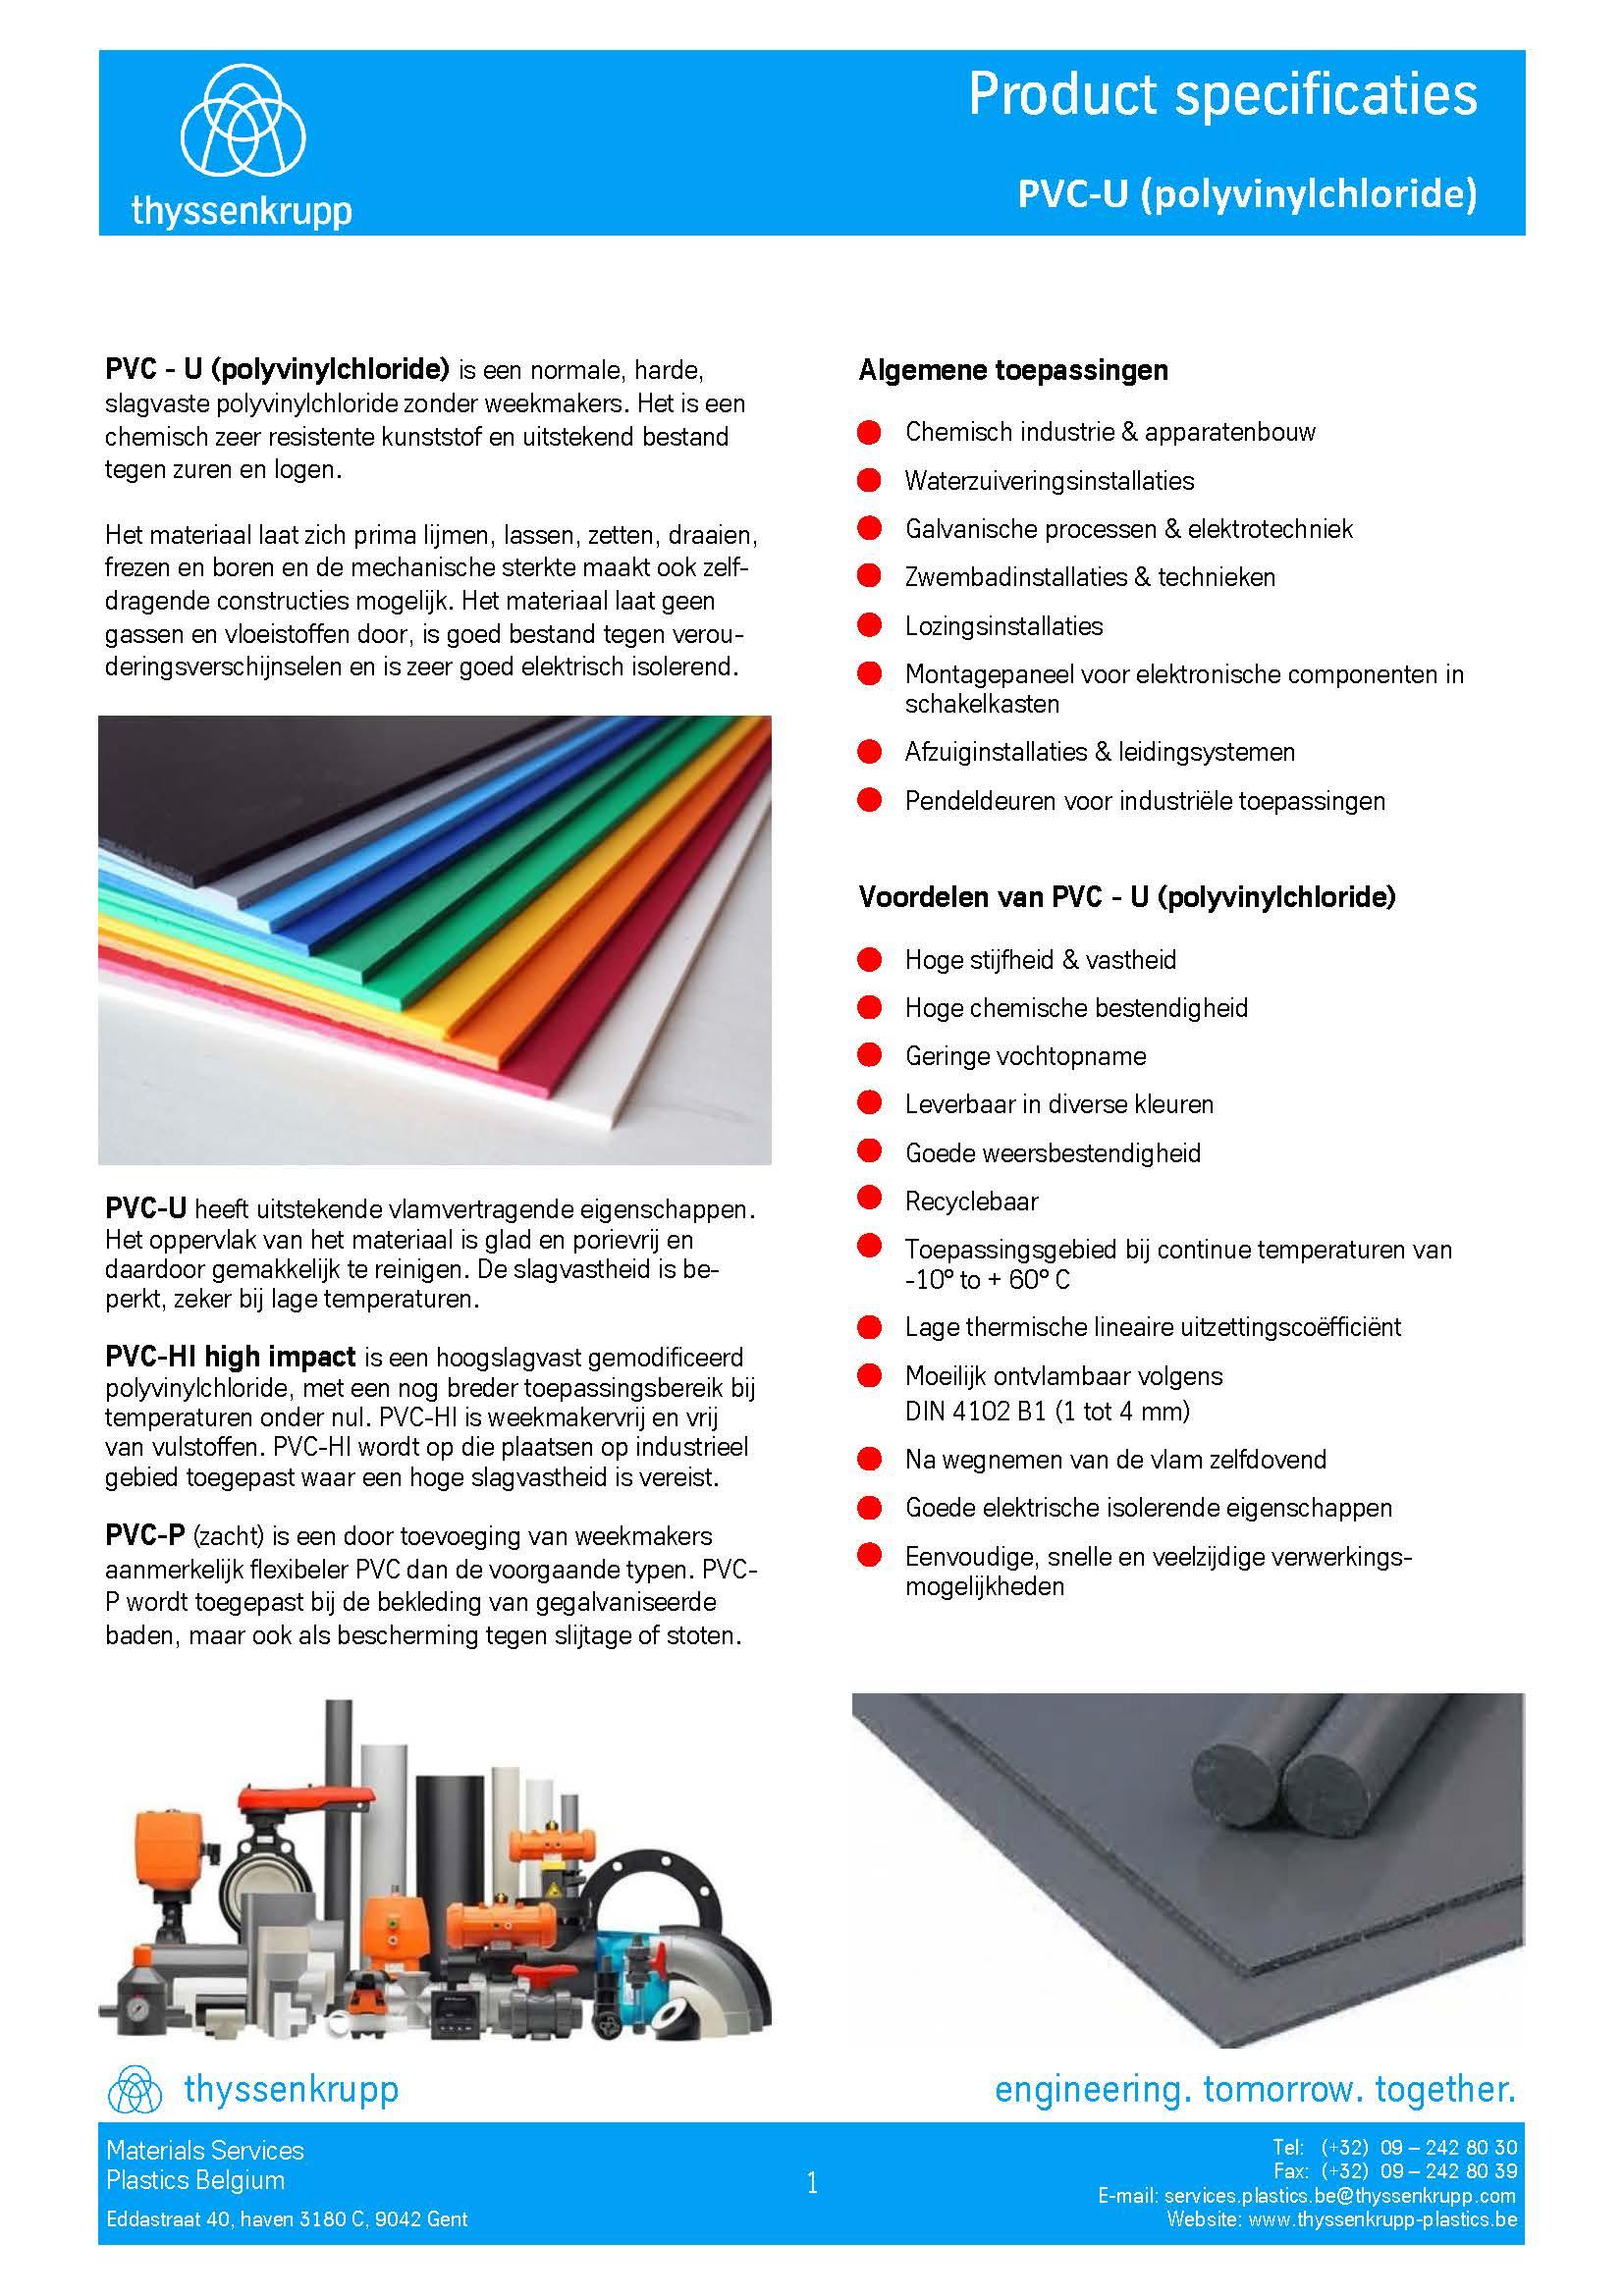 Afbeelding PVC-U staf technische' fiche